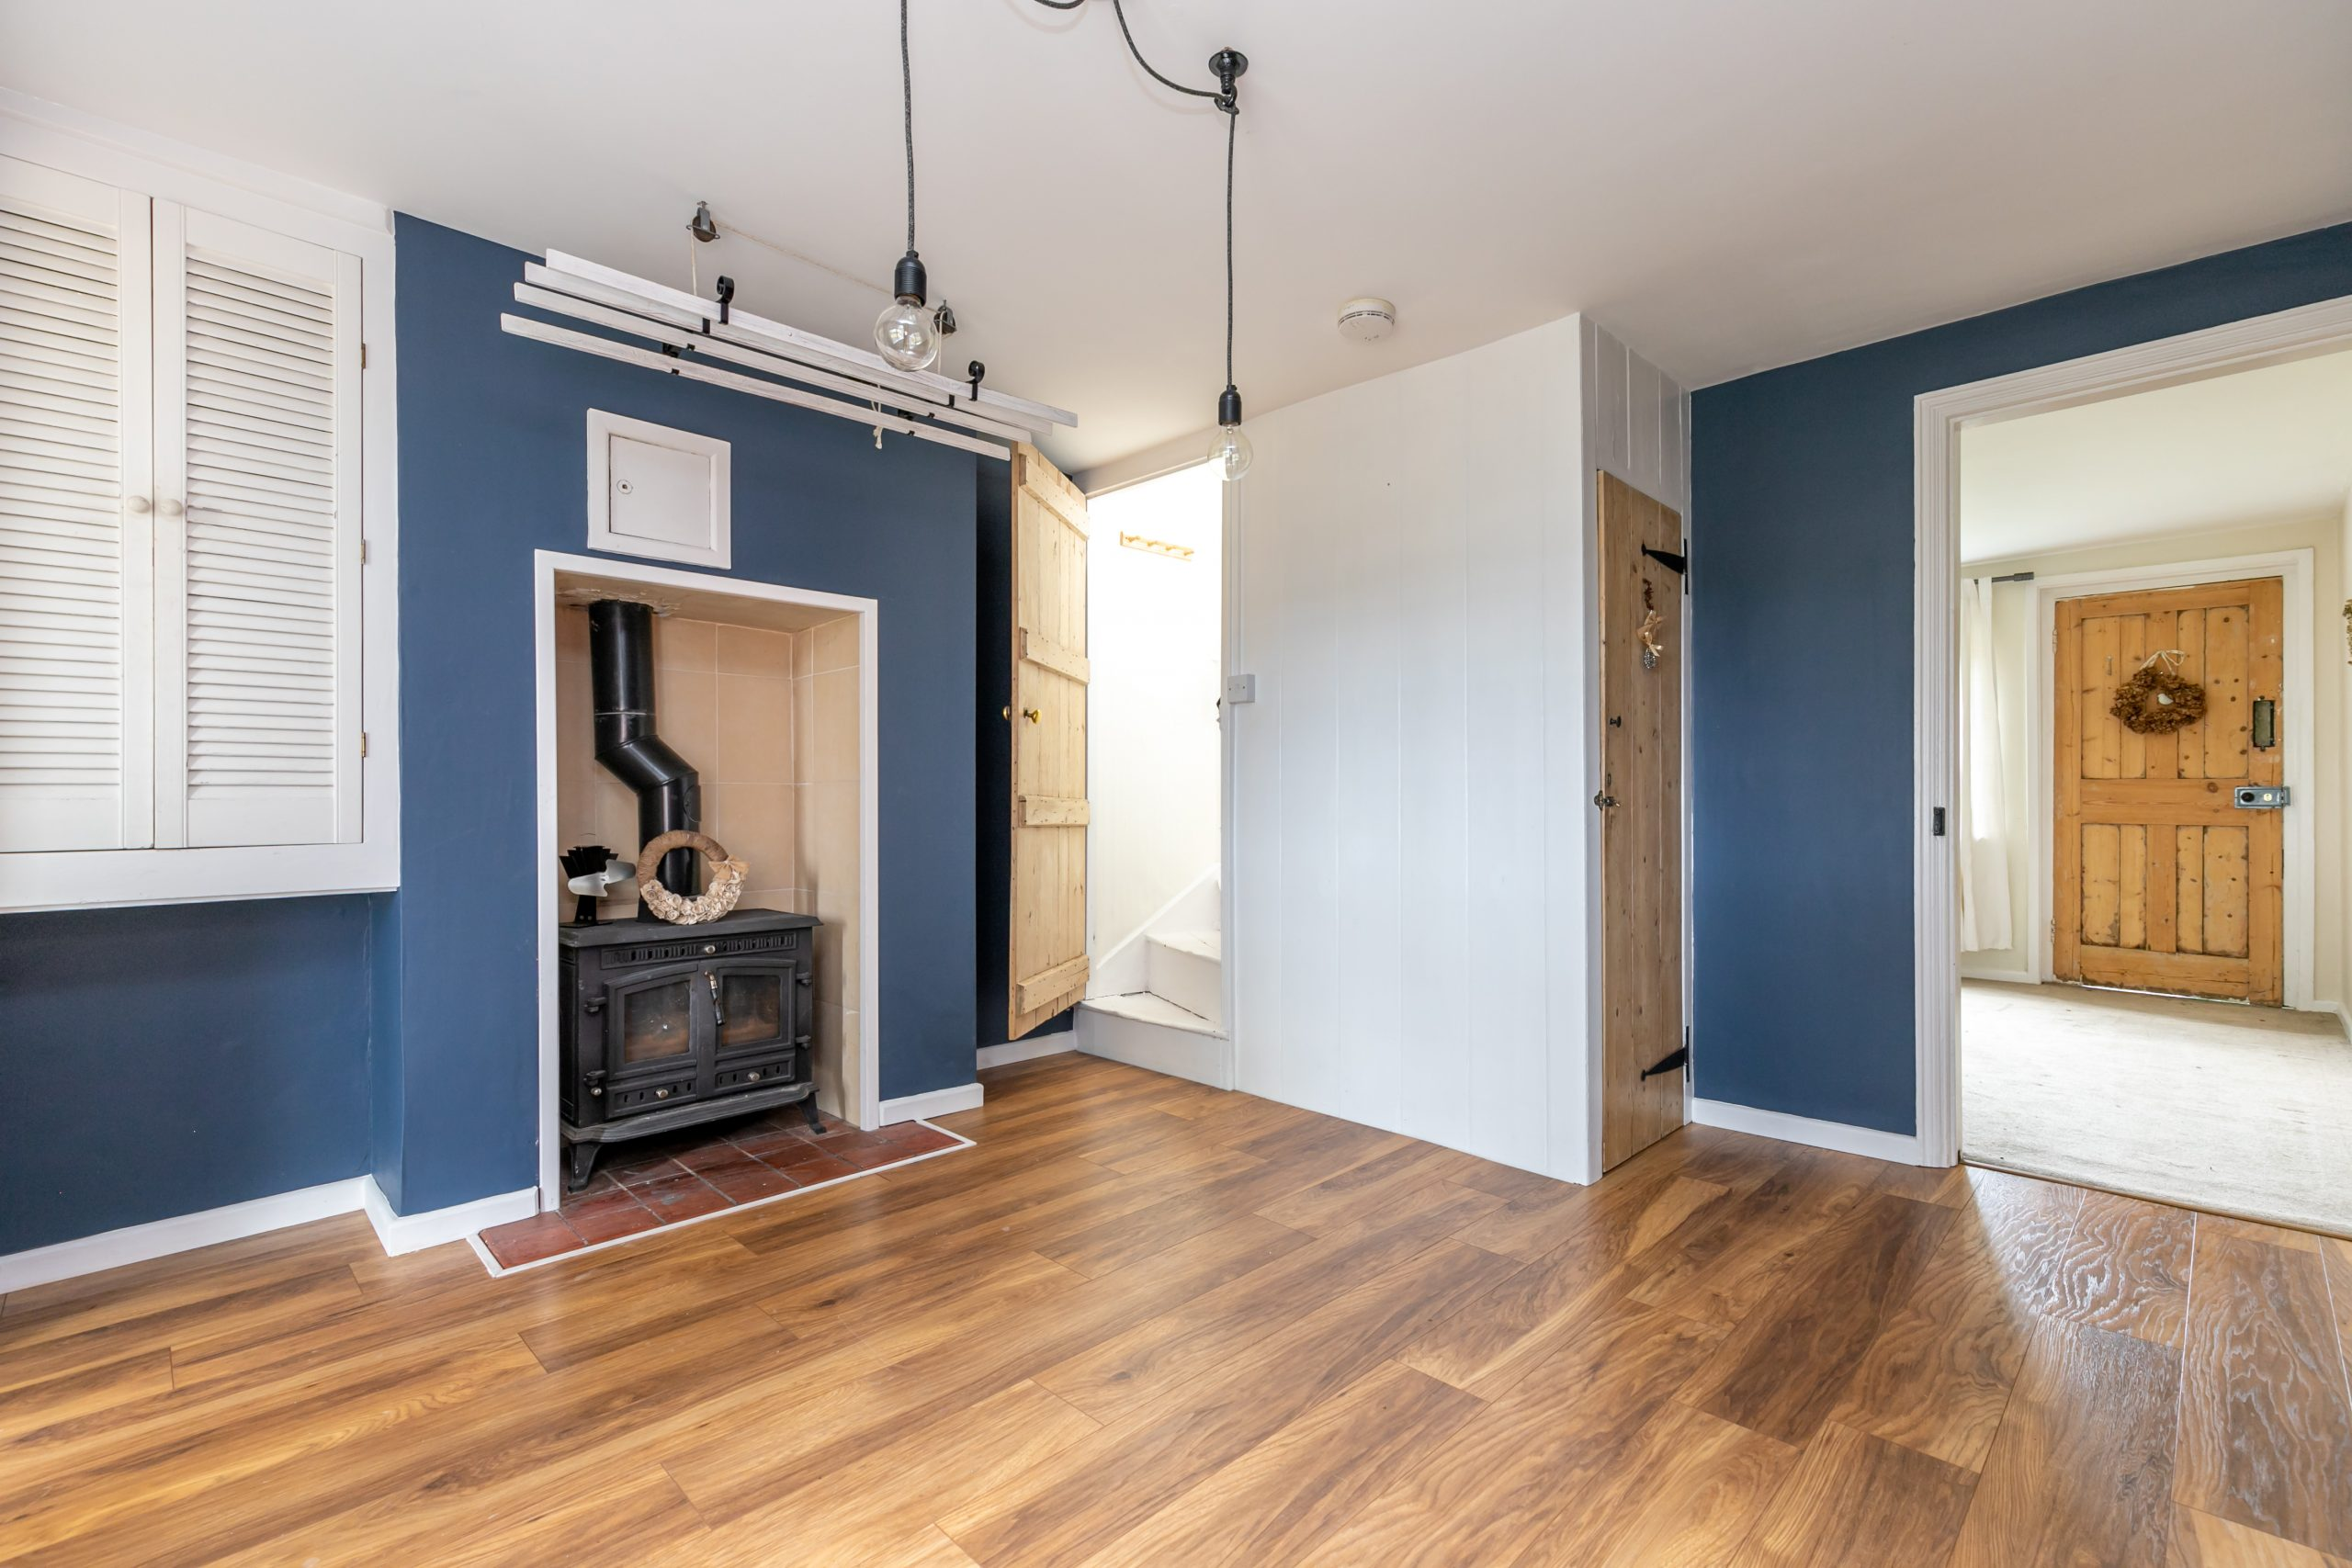 Udimore – 3 Bedroom Cottage